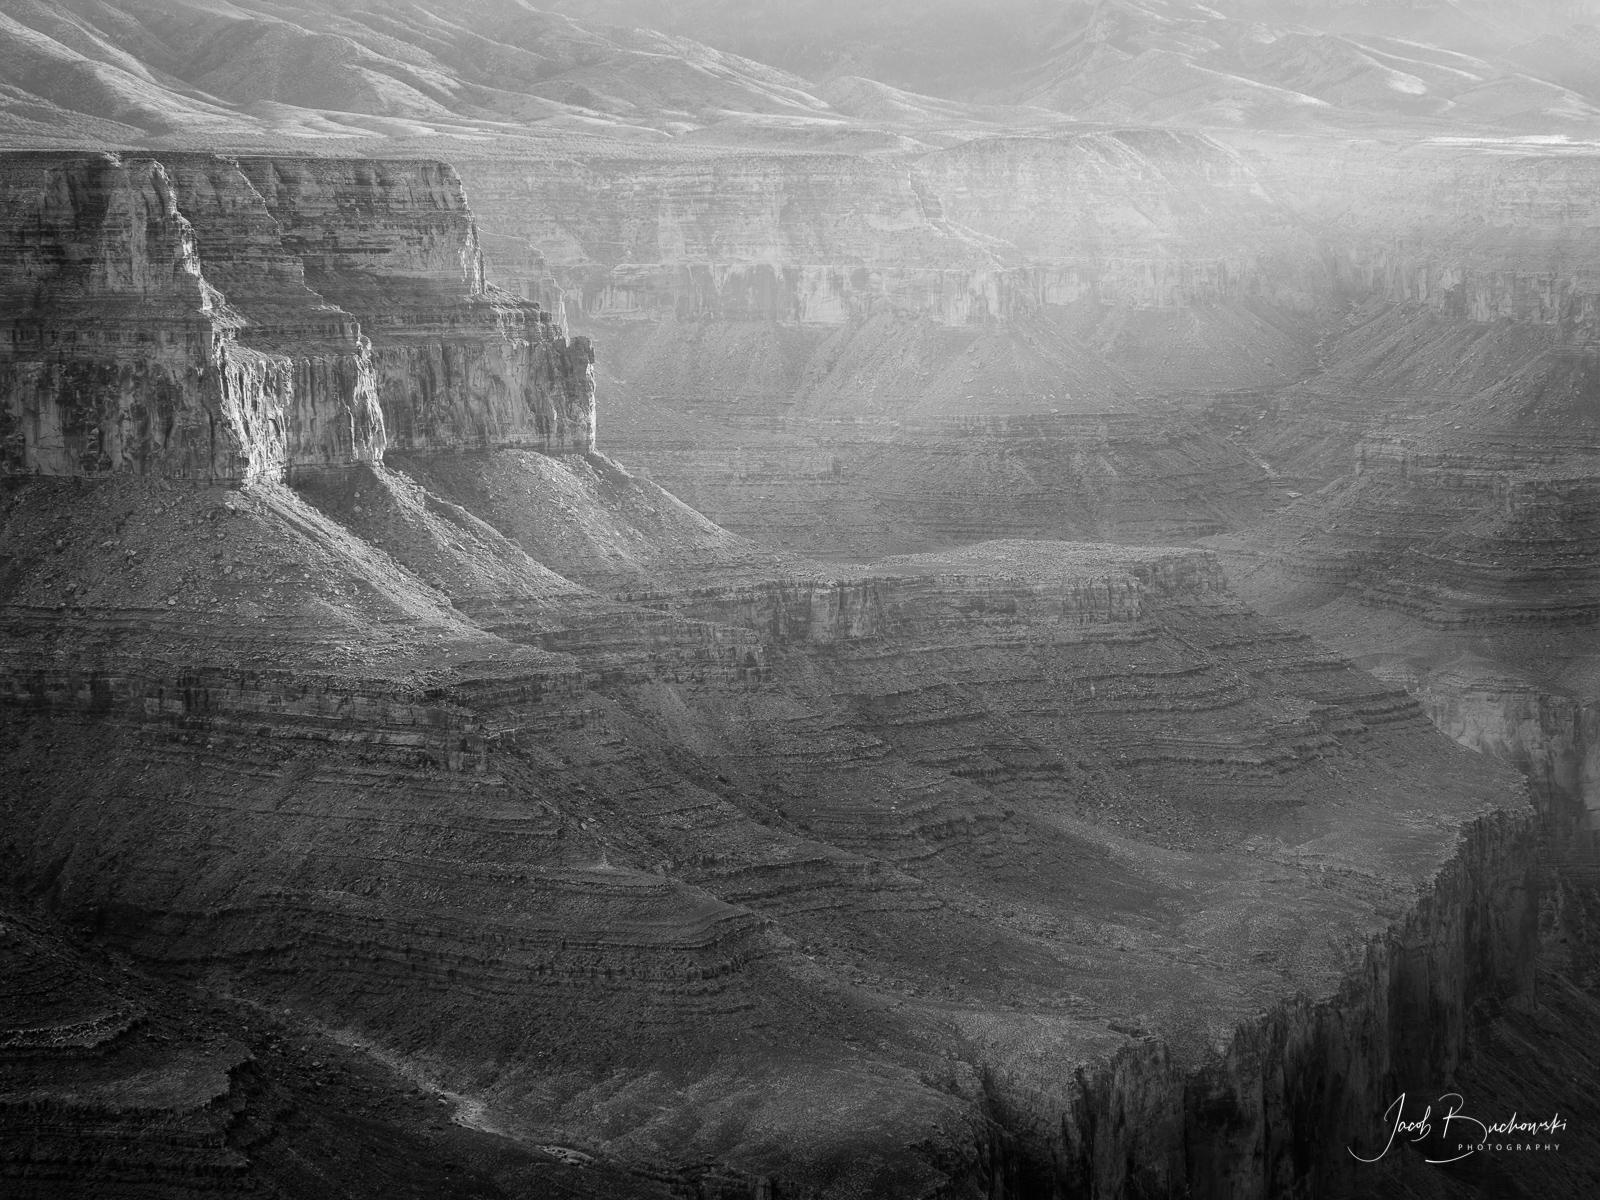 Grand Canyon, Grand Canyon National Park, Arizona, photo